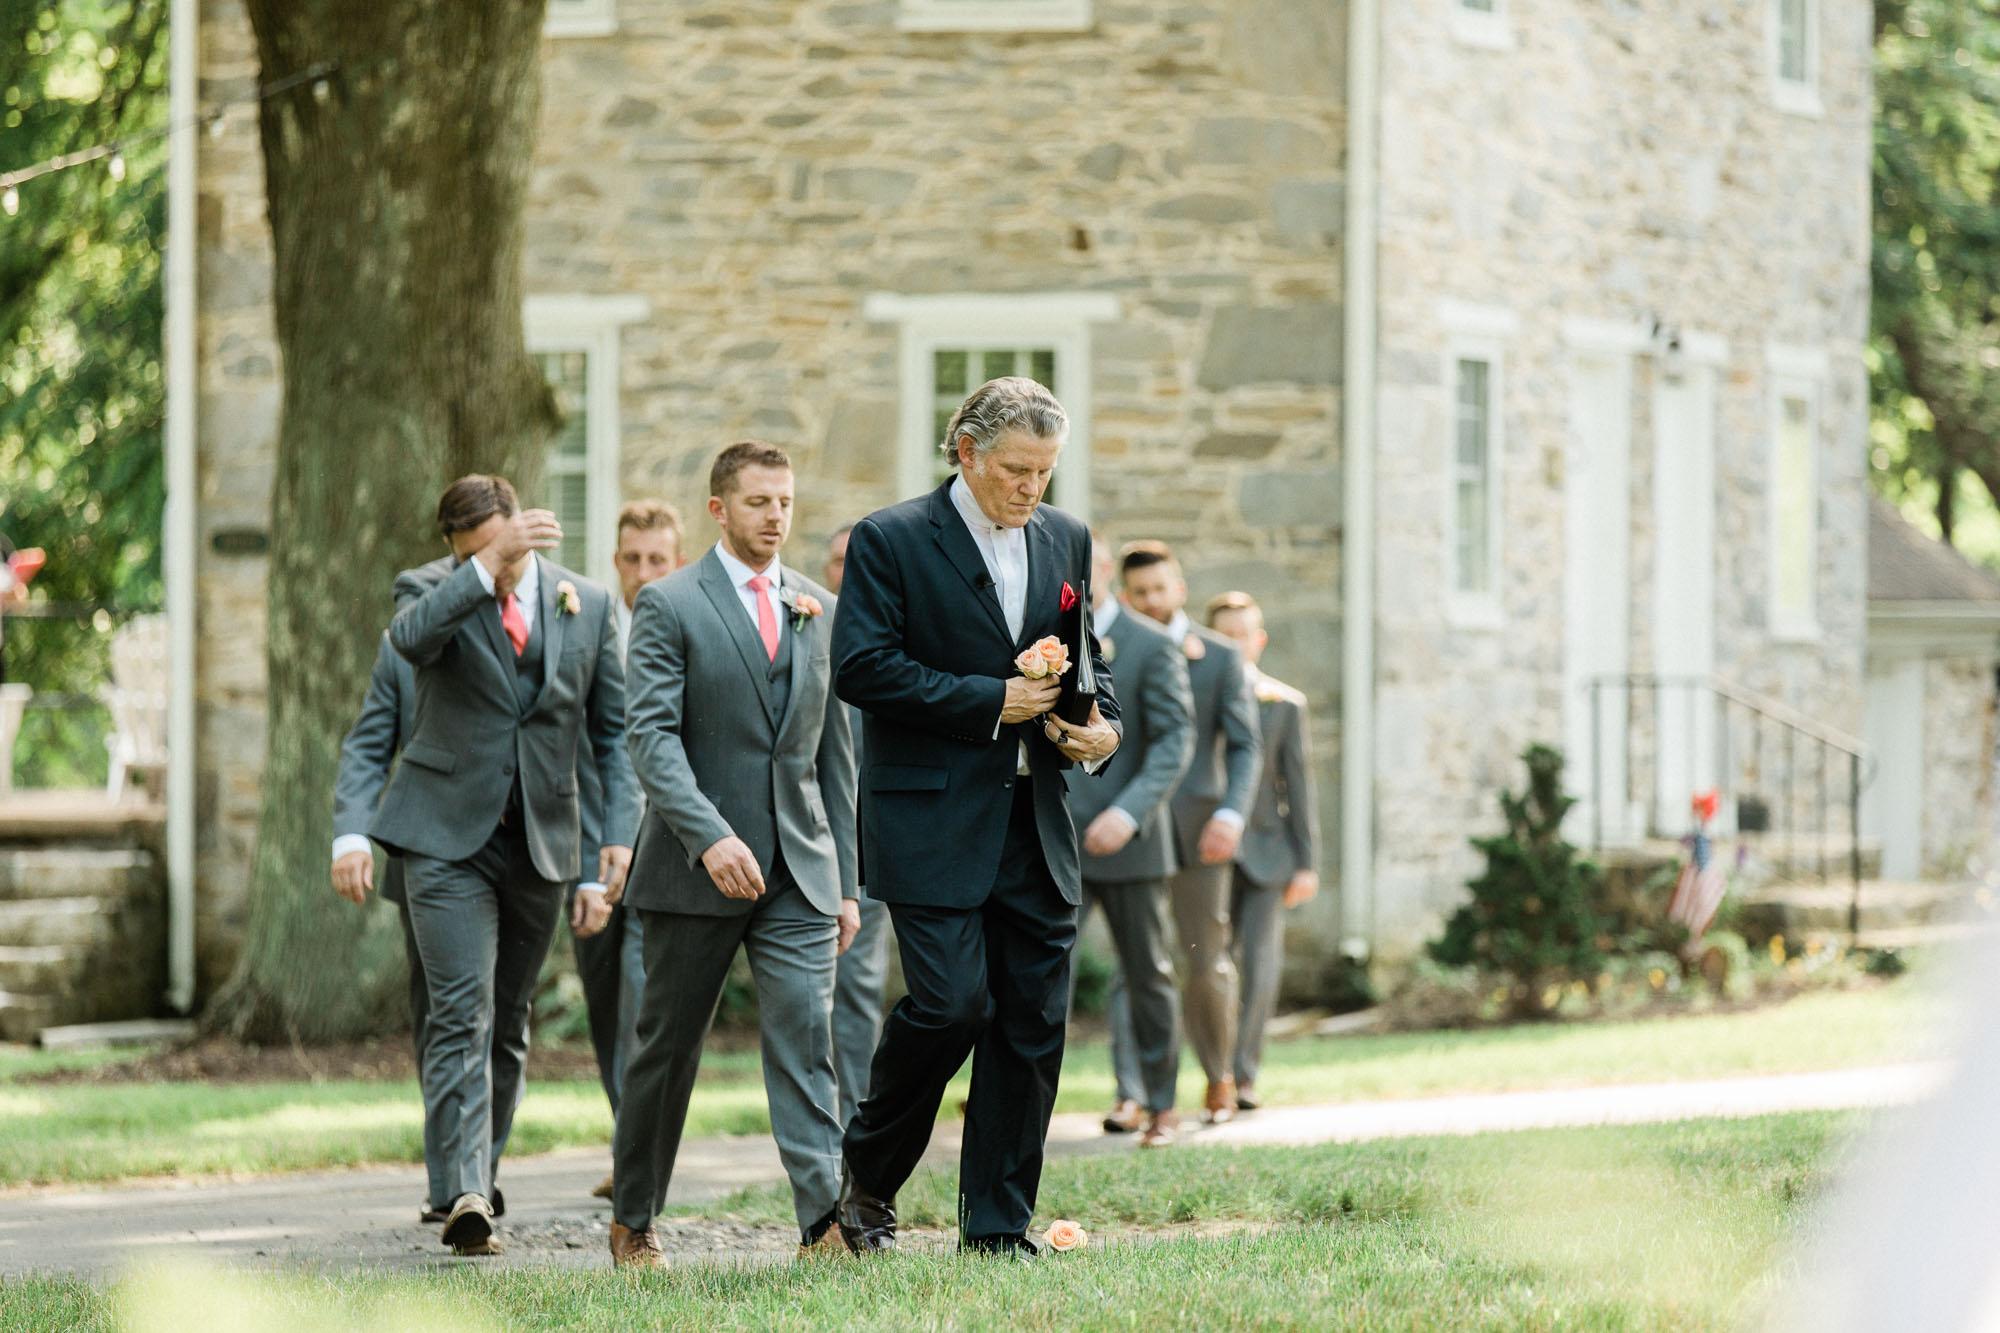 Allenberry-resort-historic-pennsylvania-wedding-21829.jpg